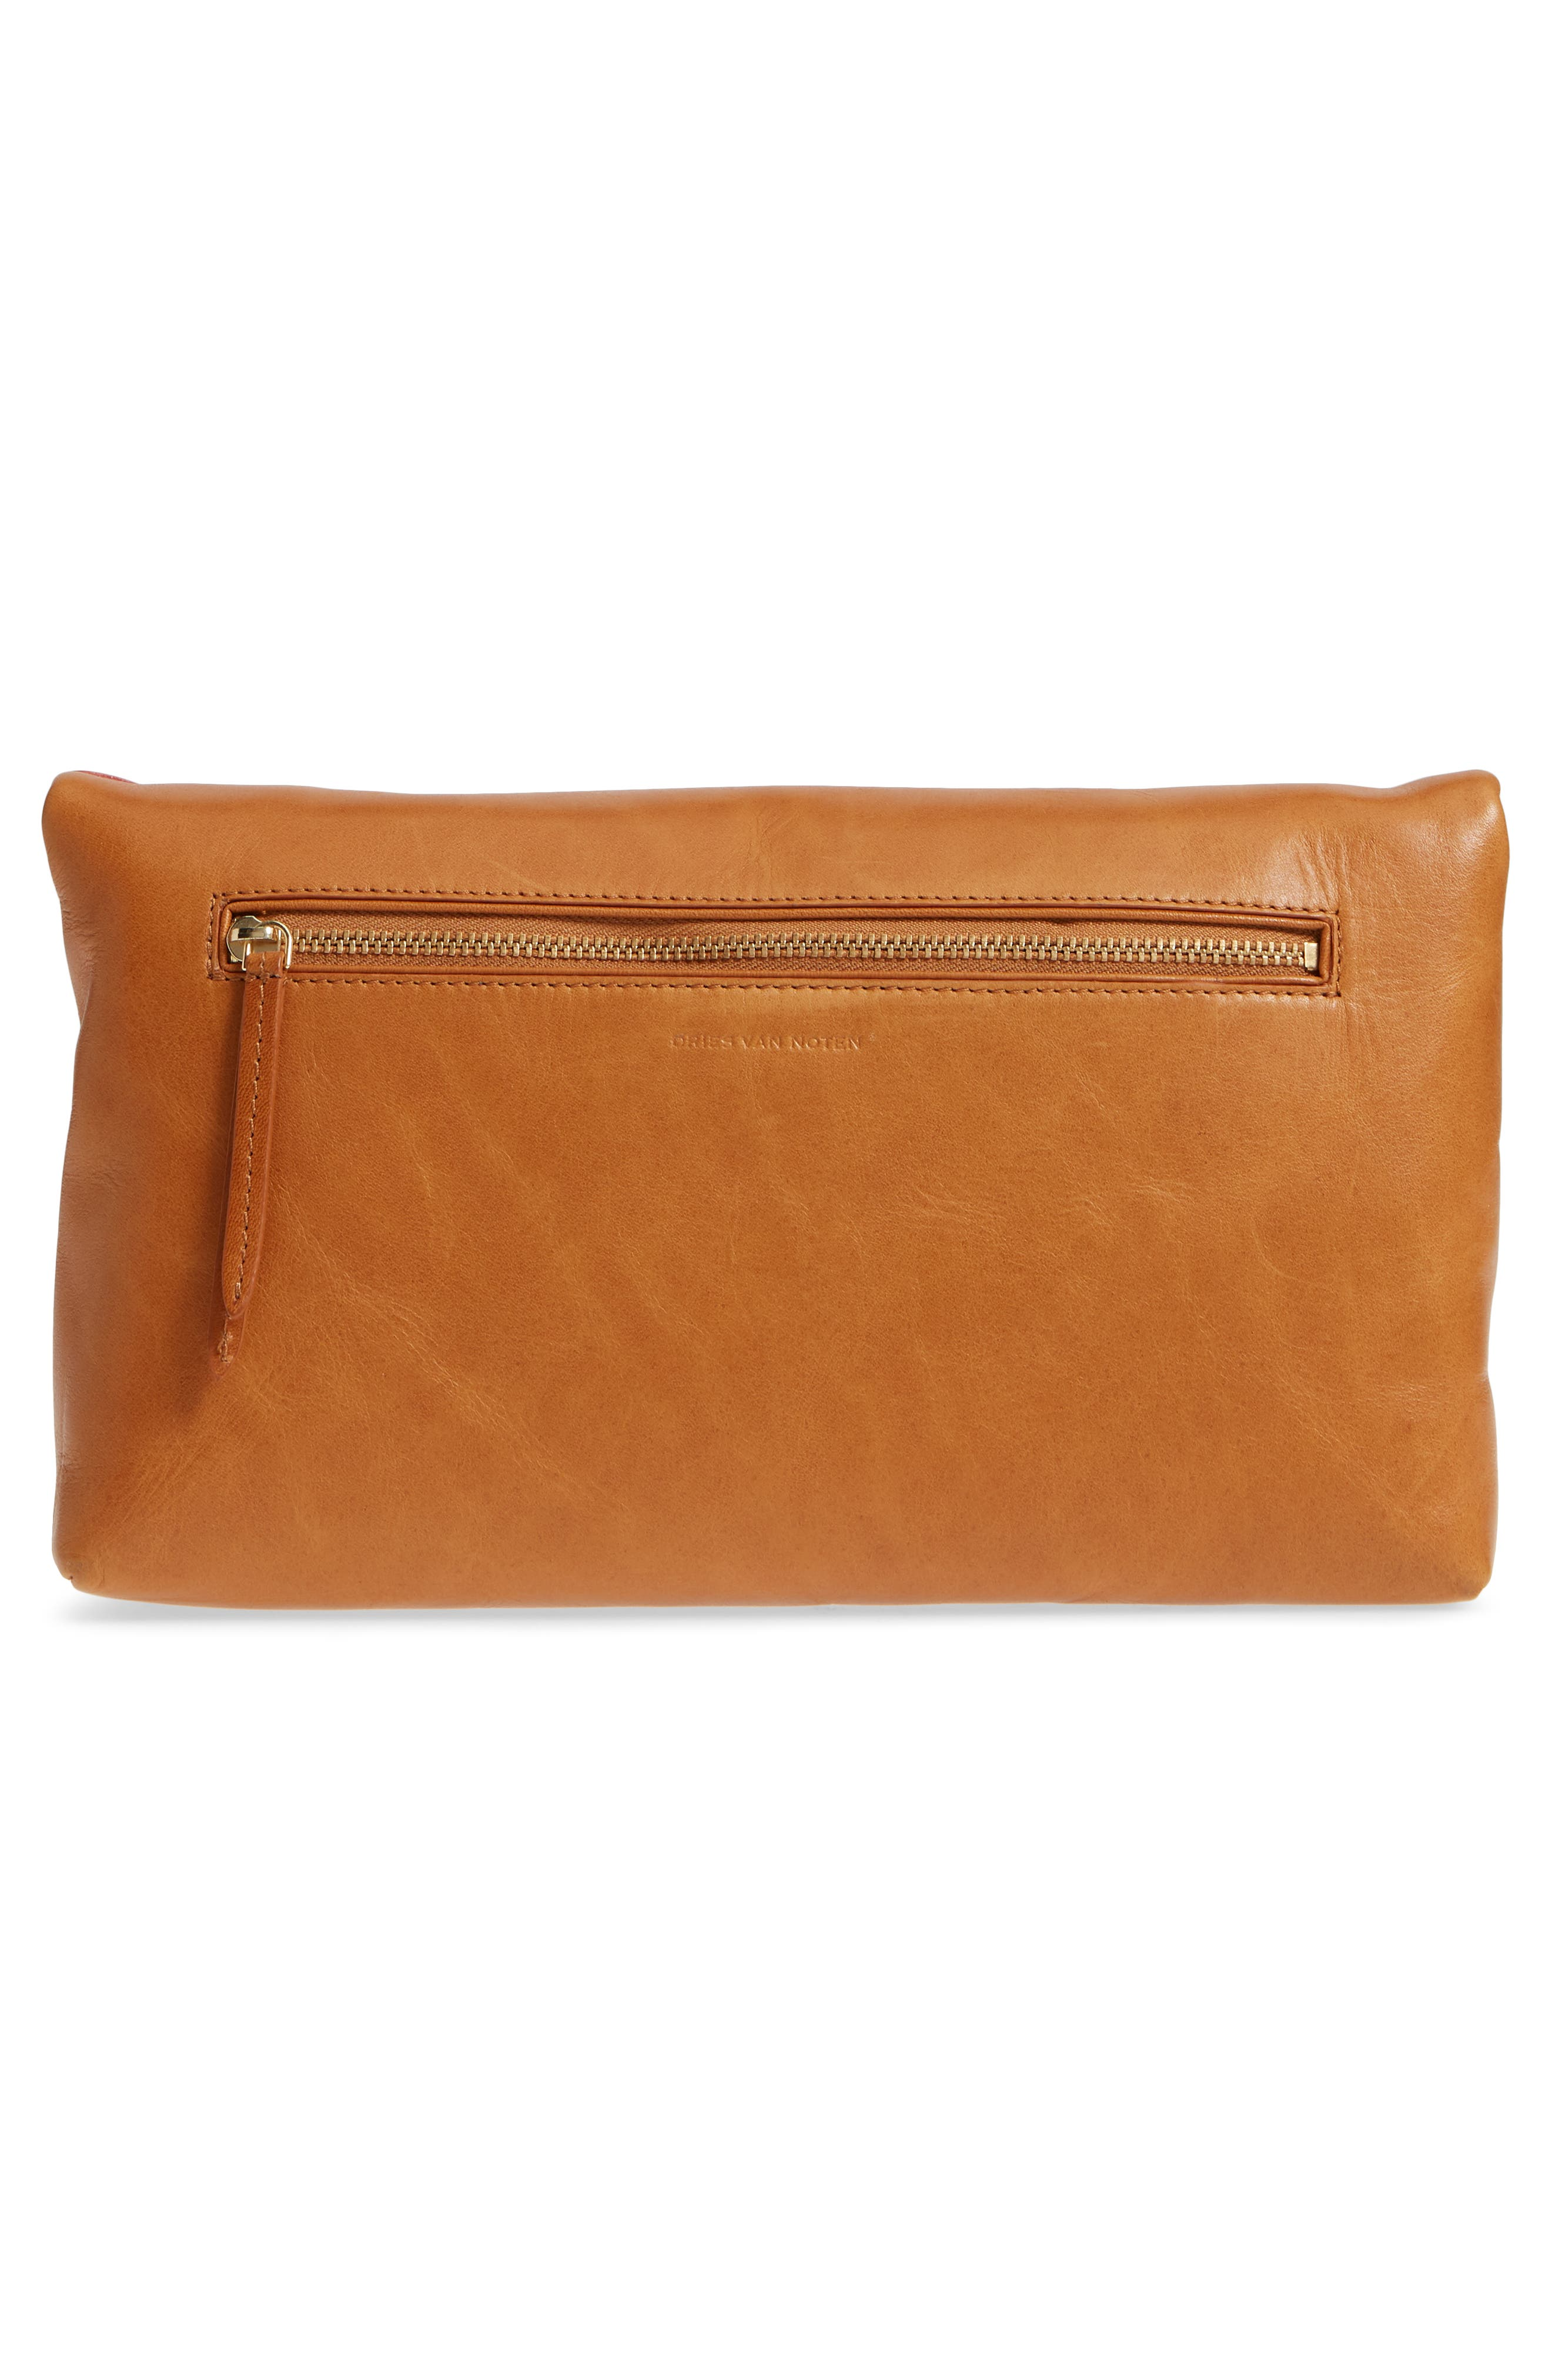 Leather Envelope Clutch,                             Alternate thumbnail 3, color,                             Camel